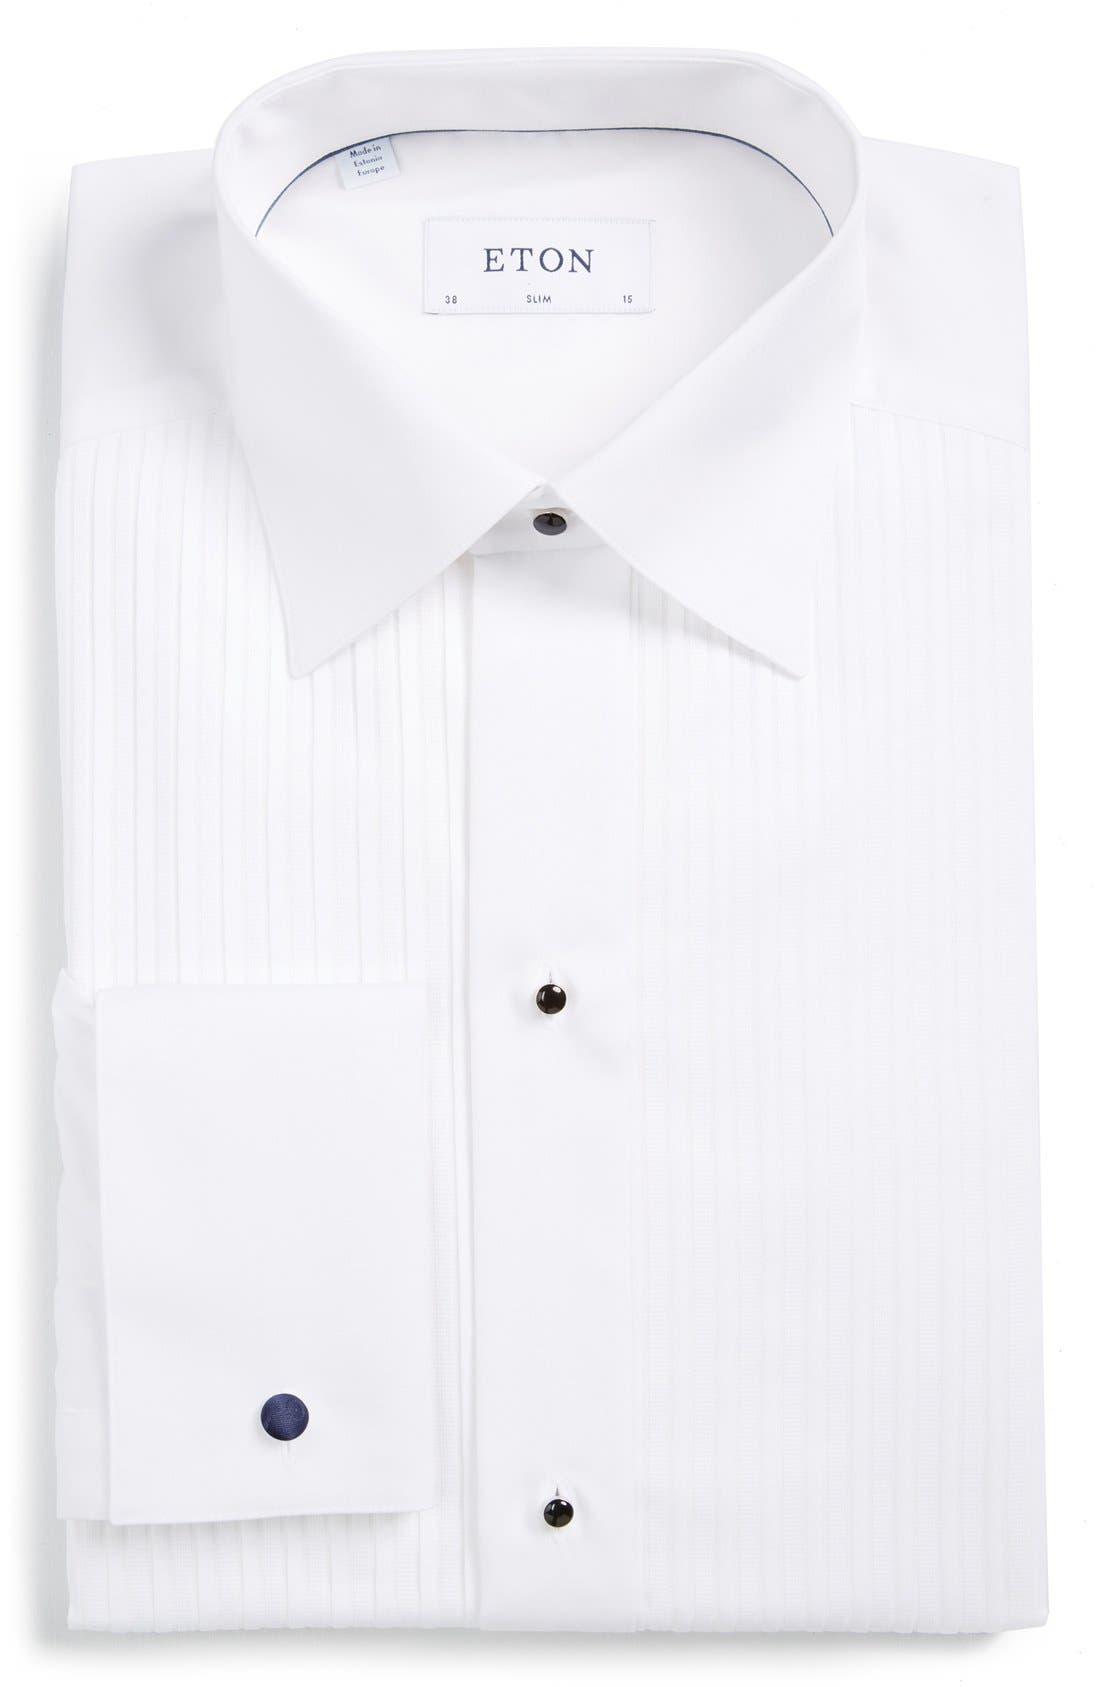 Alternate Image 1 Selected - Eton Slim Fit Tuxedo Shirt